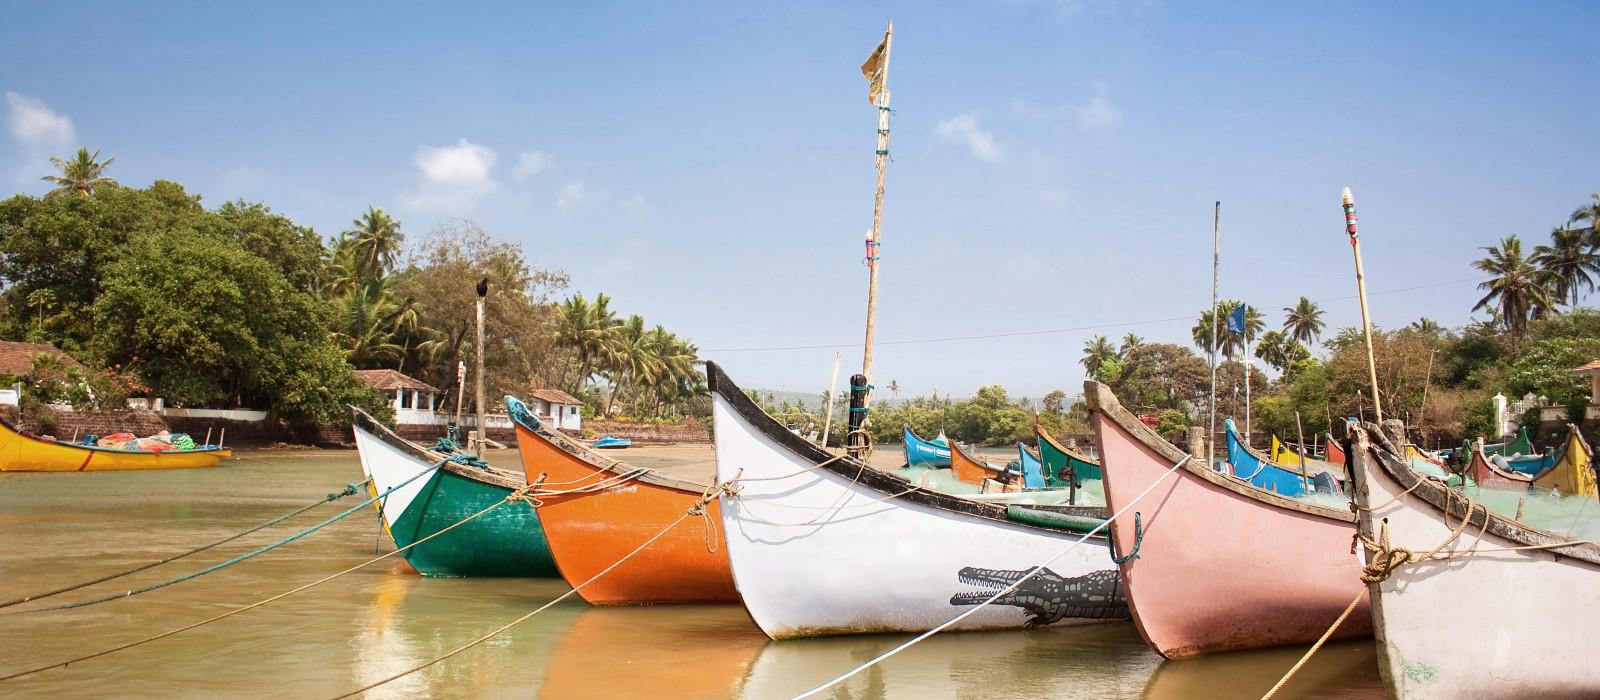 Hotel Ahilya by the Sea Zentral- & Westindien